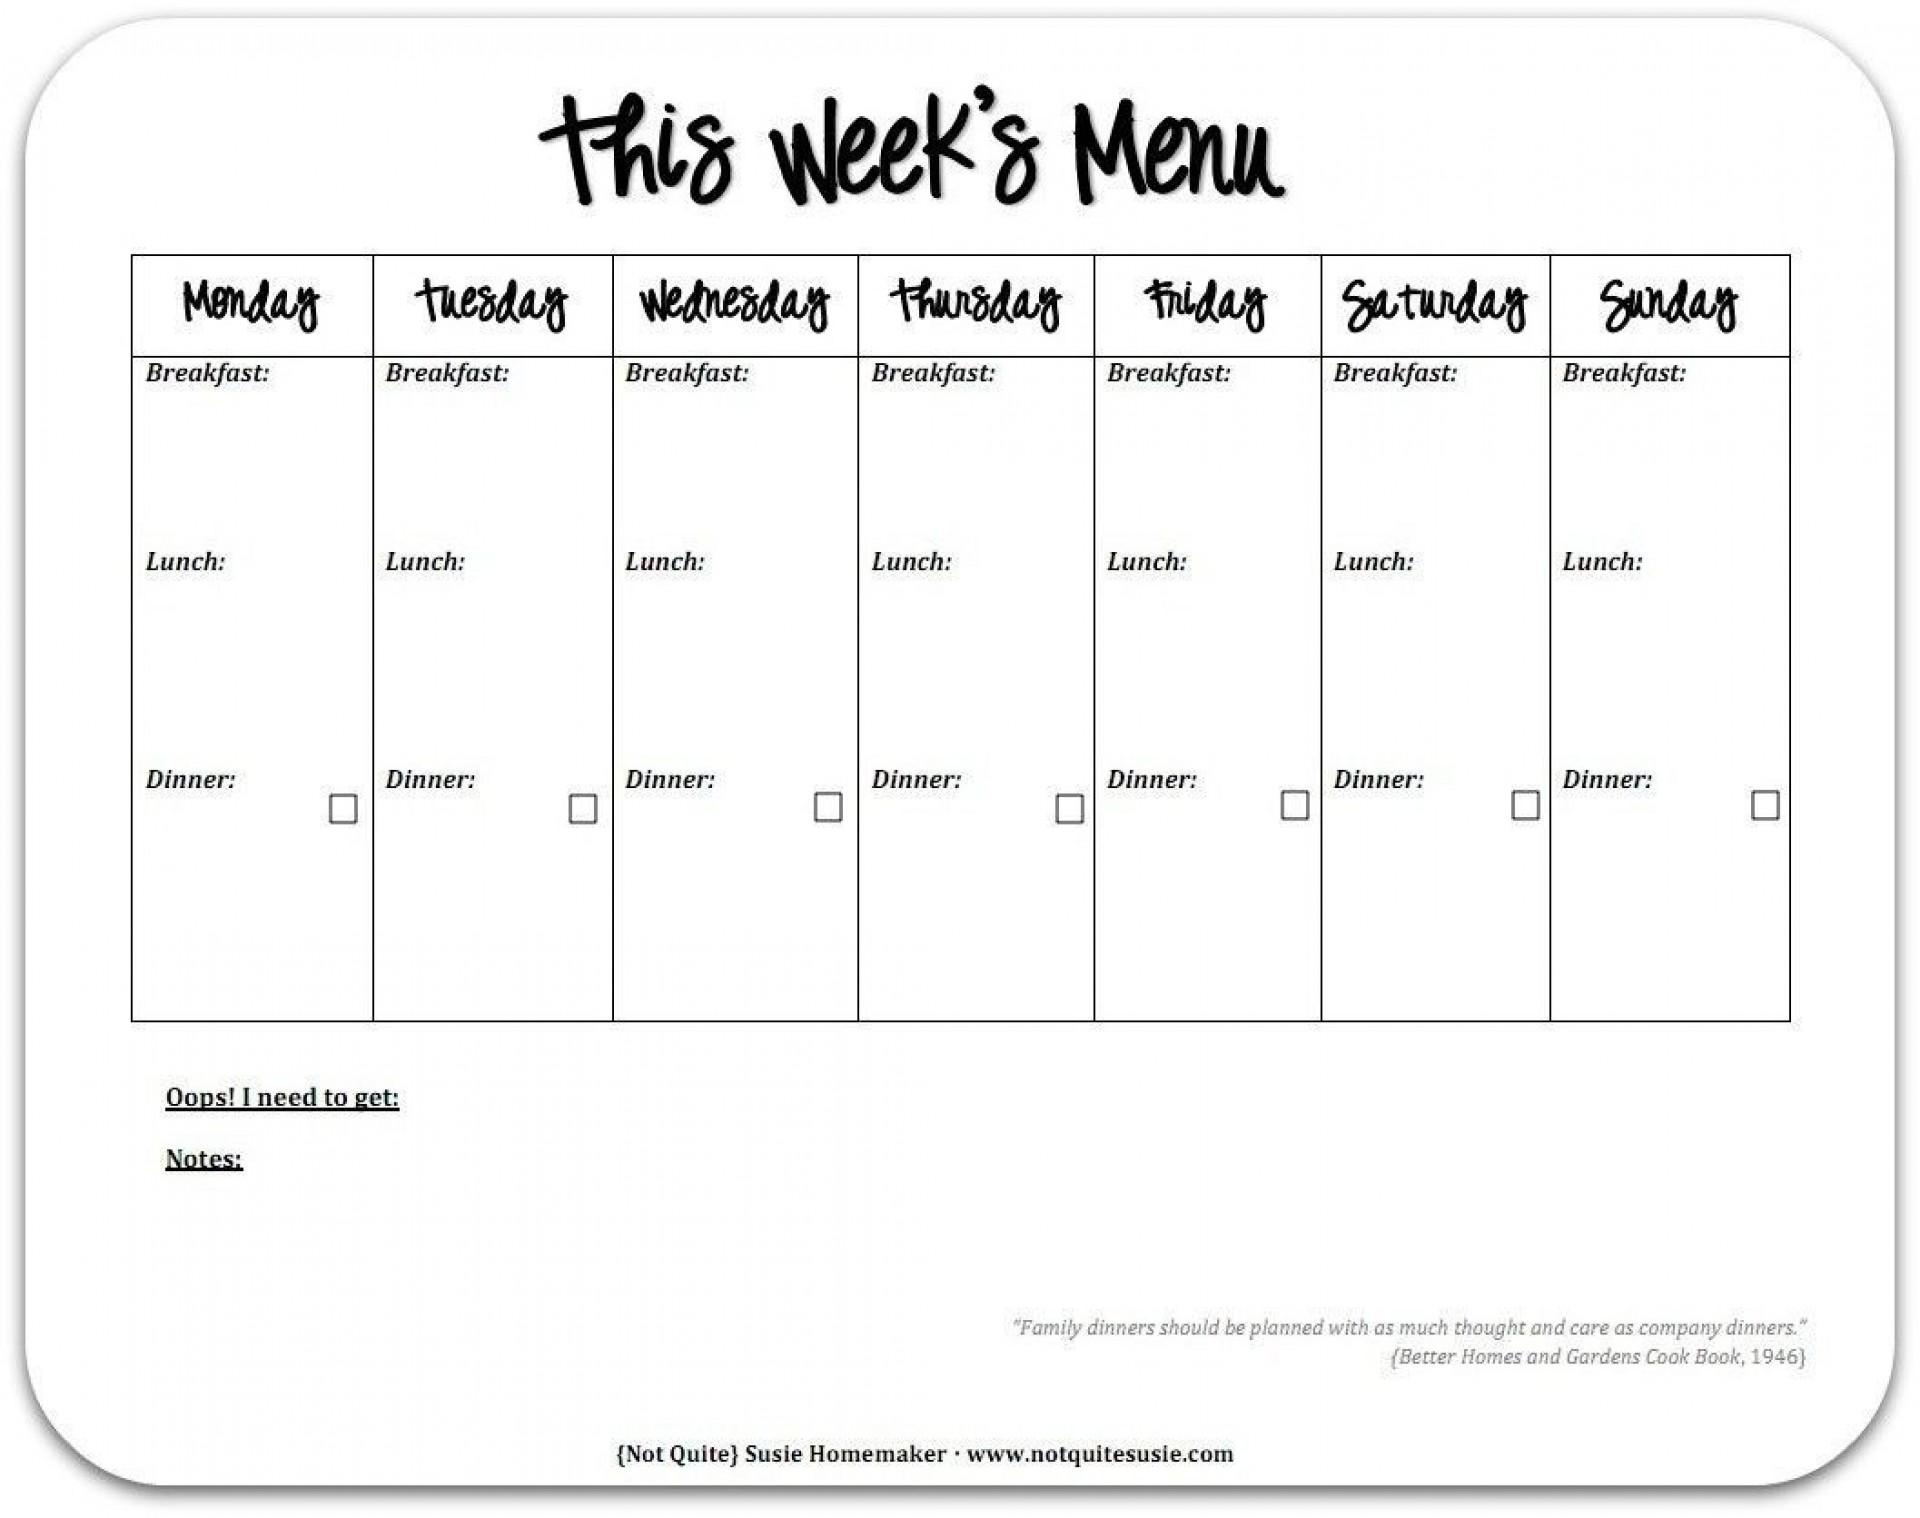 000 Breathtaking 2 Week Meal Plan Printable Concept 1920